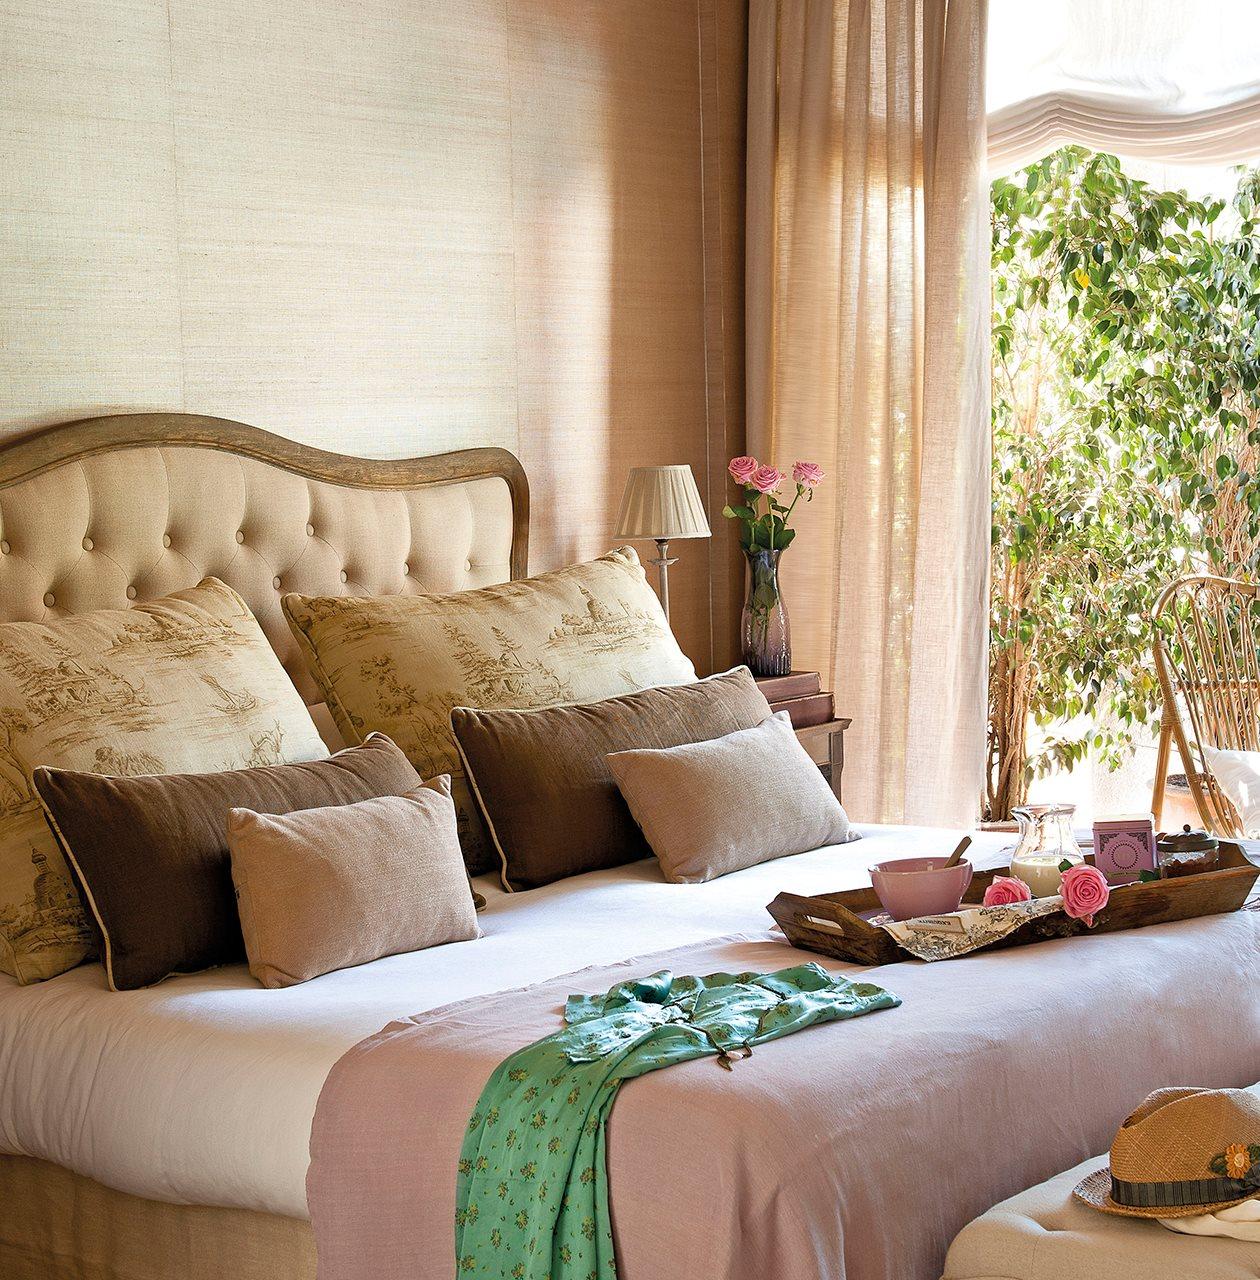 Diez cabeceros distintos adecuados para diferentes necesidades - Cabecero cama acolchado ...